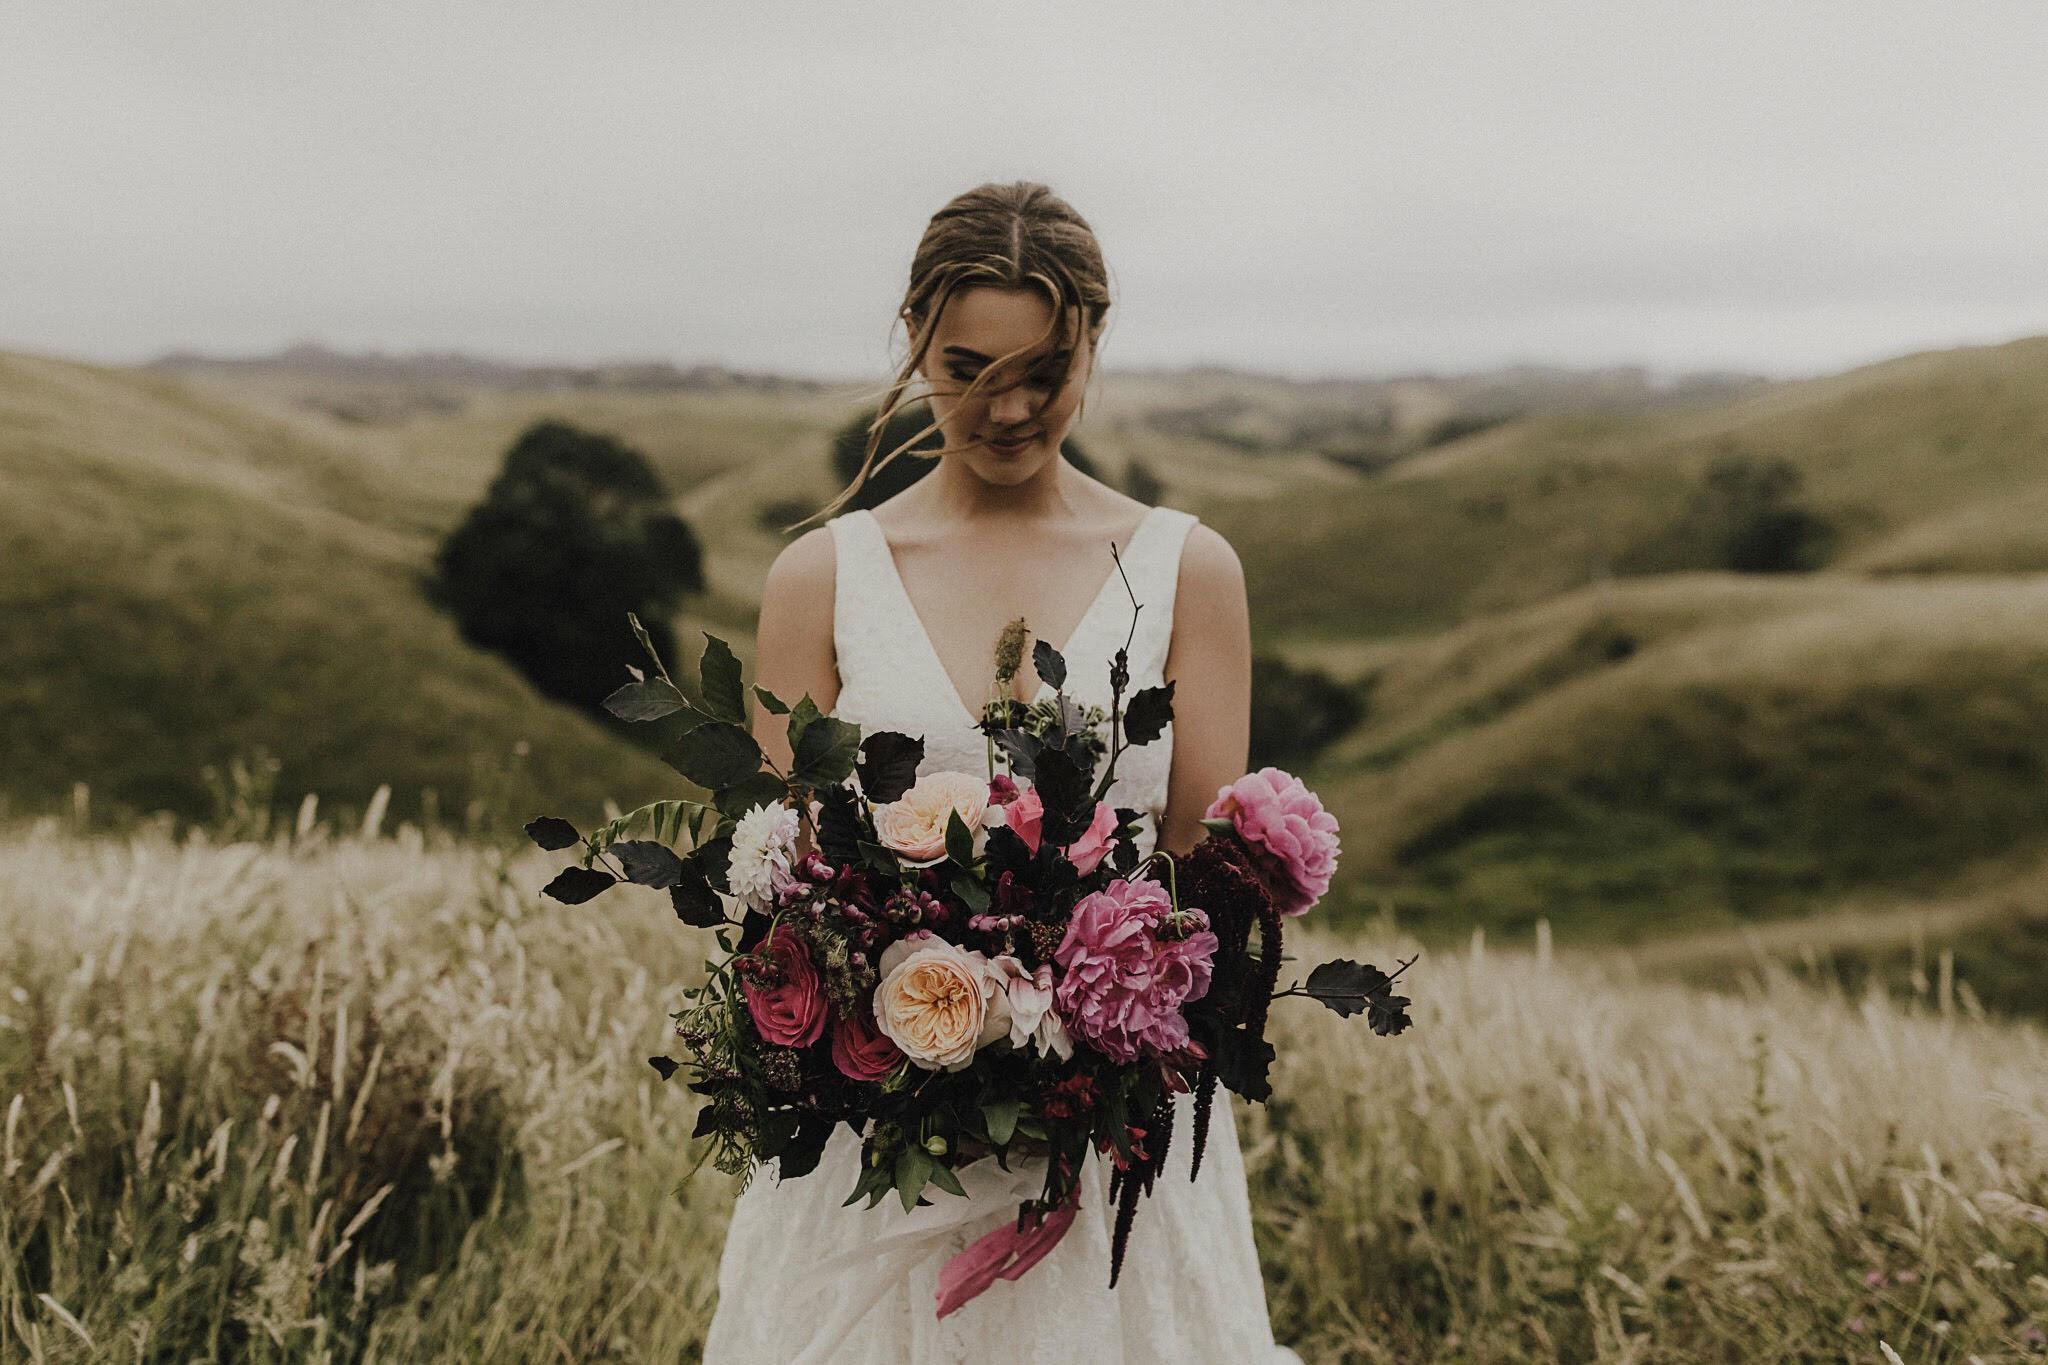 On My Hand Florist - Real wedding portfolio - Sasha and Josh - bride with large bouquet